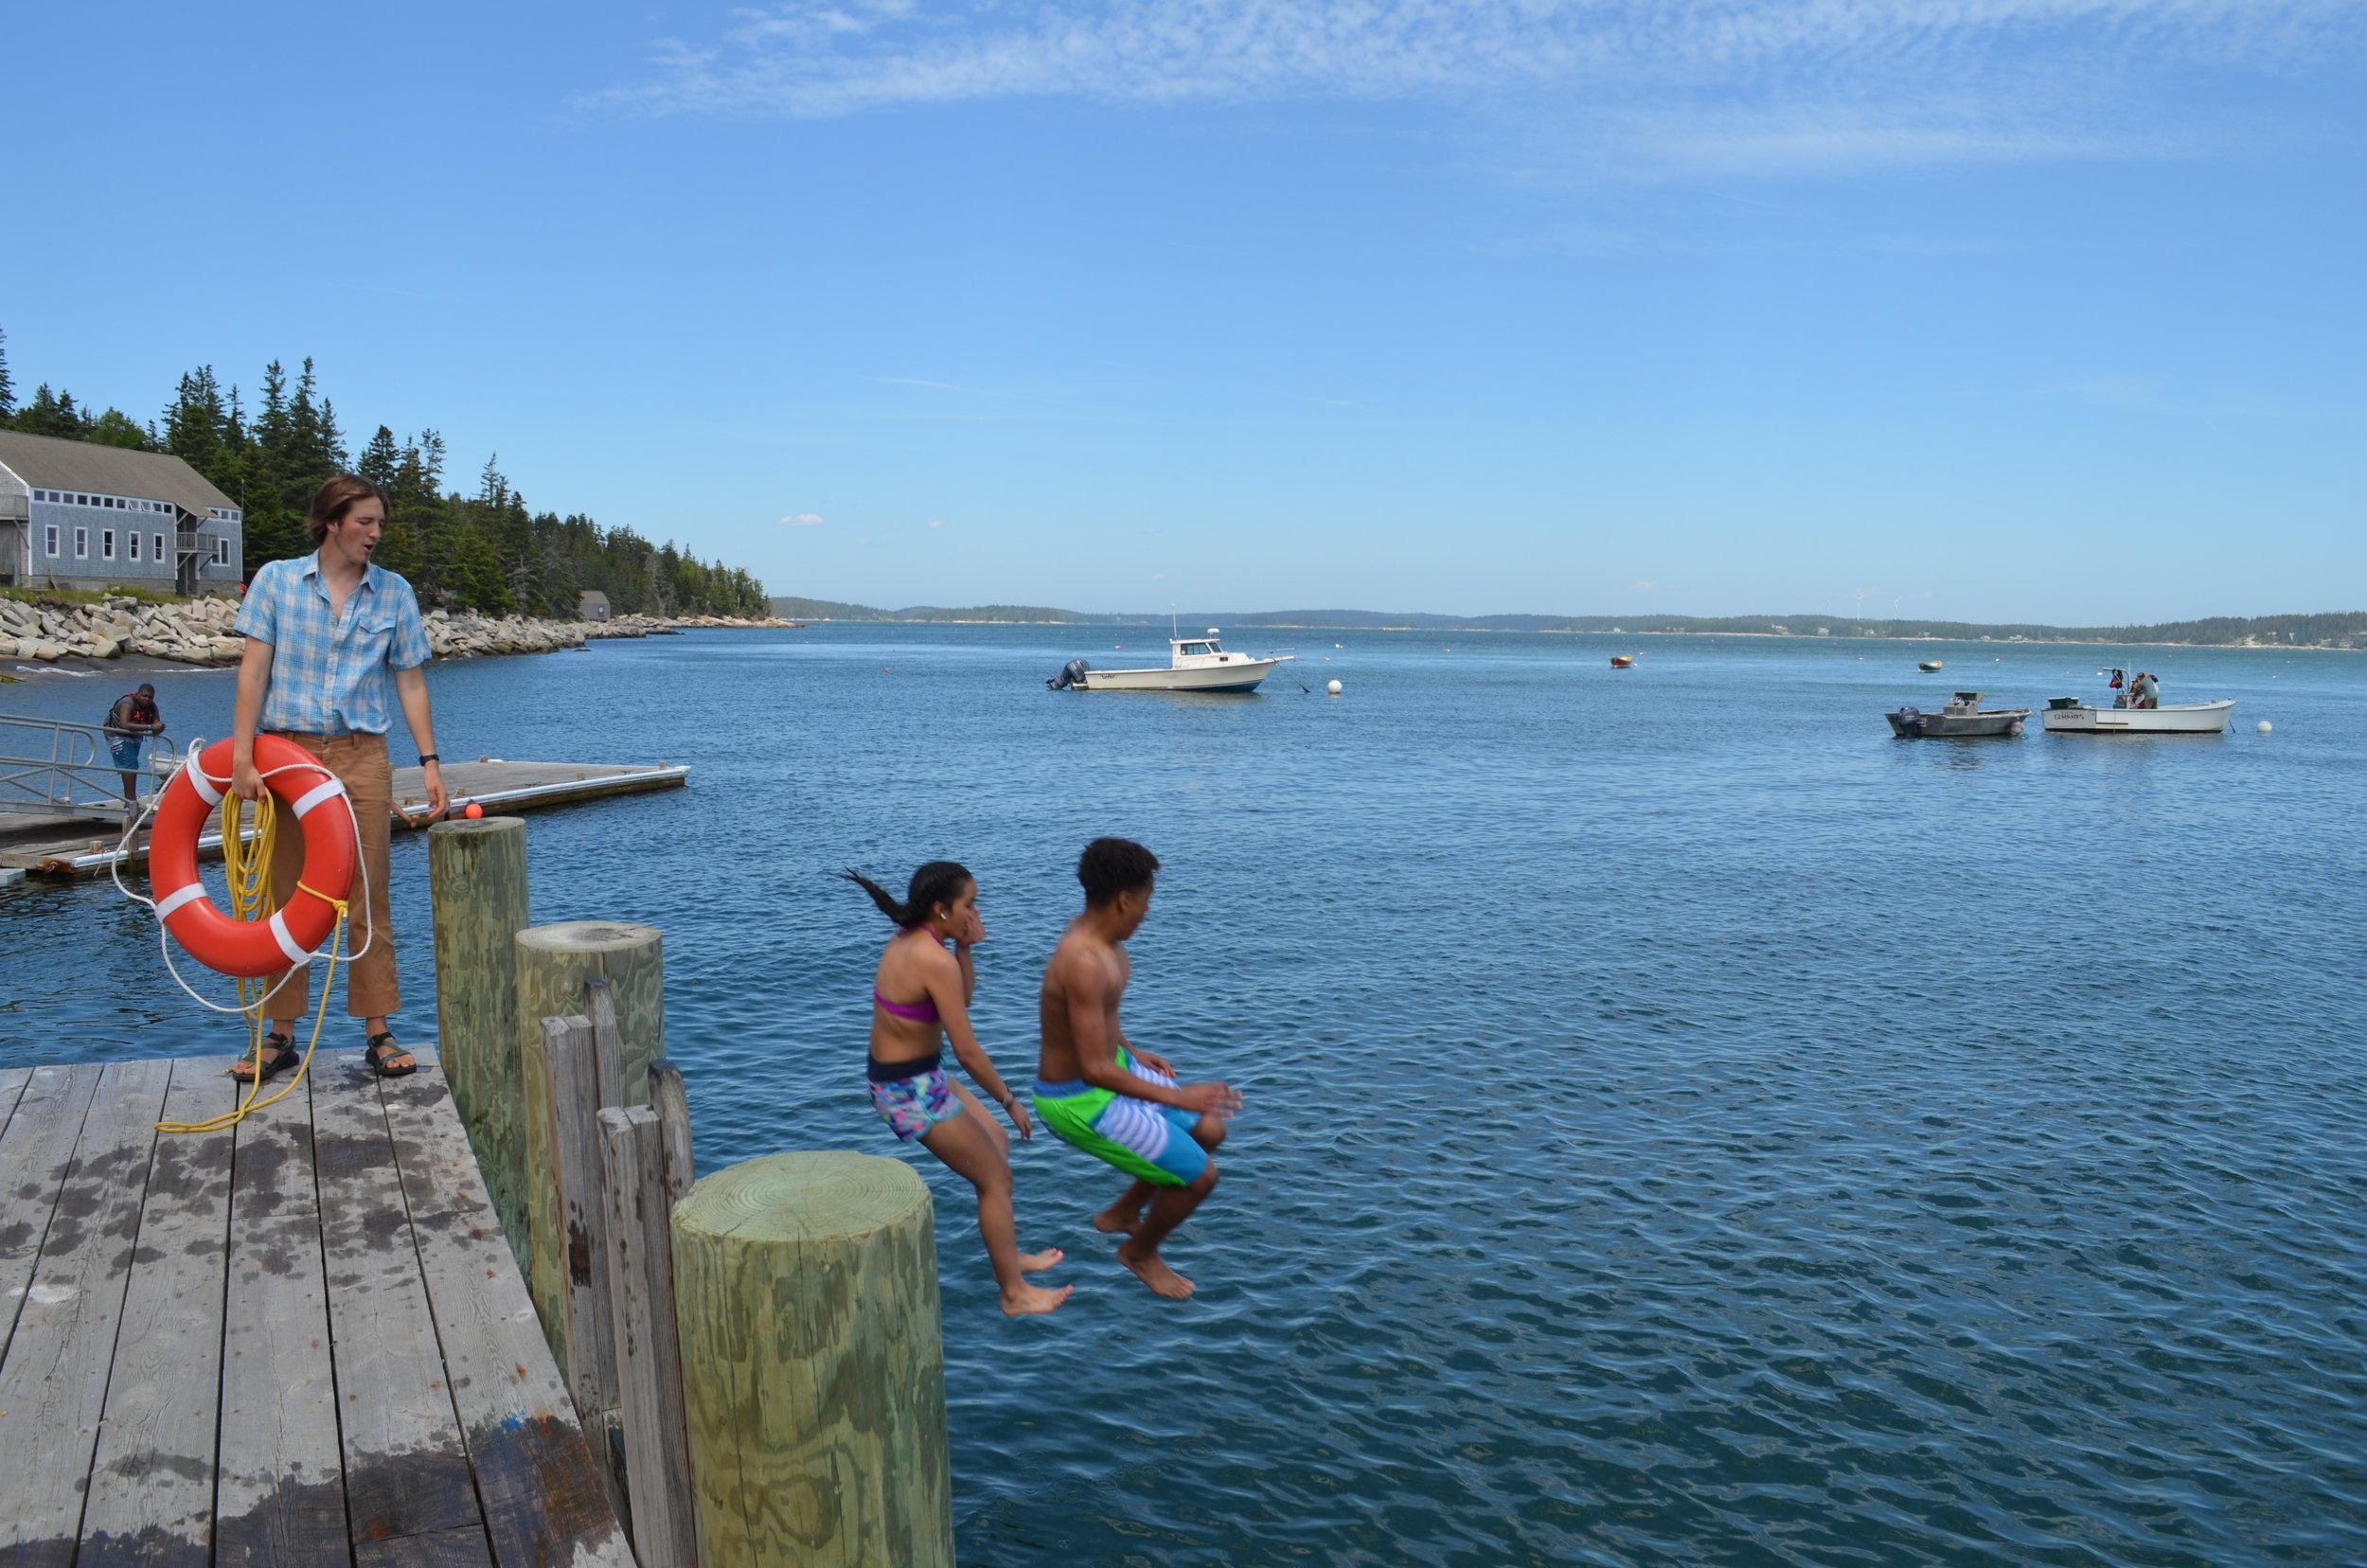 Anayah and Dario jumping into the cold water!